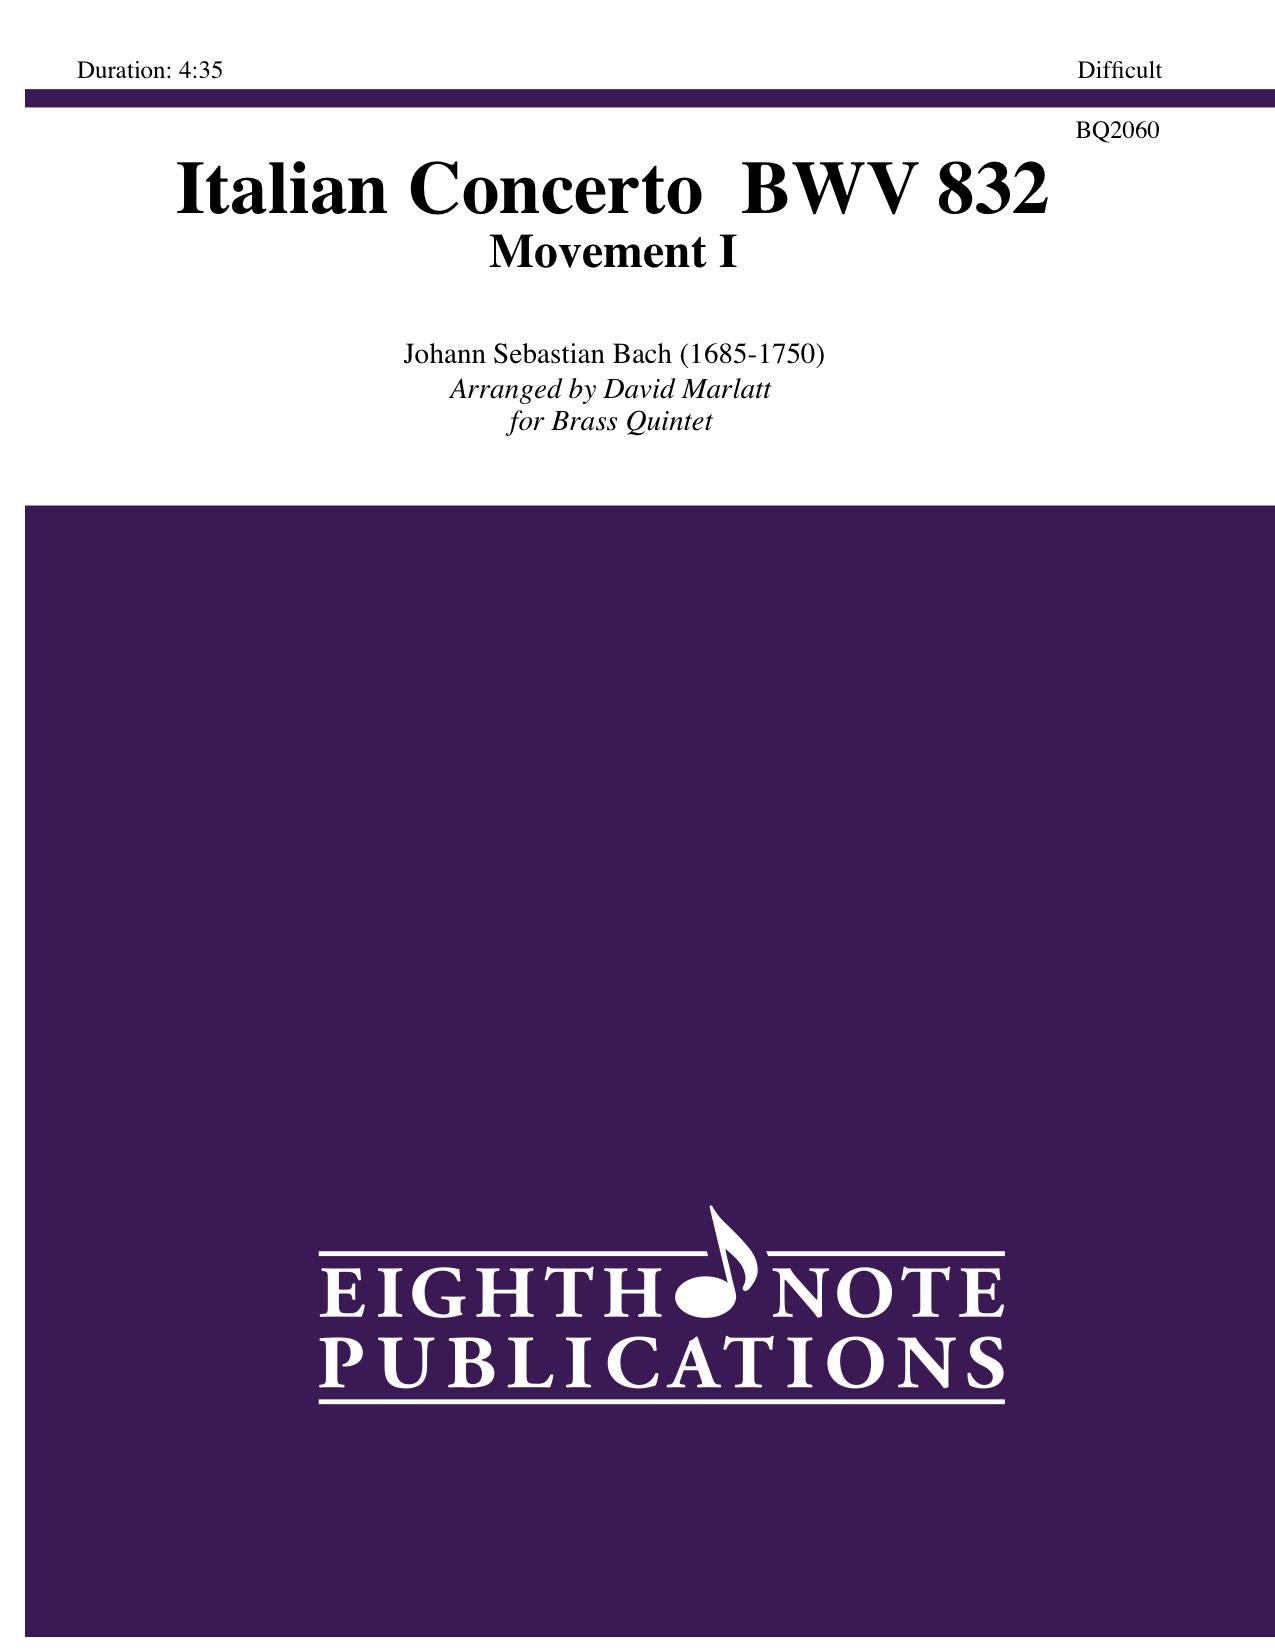 Italian Concerto-Movement I    BWV 832 - Johann Sebastian Bach